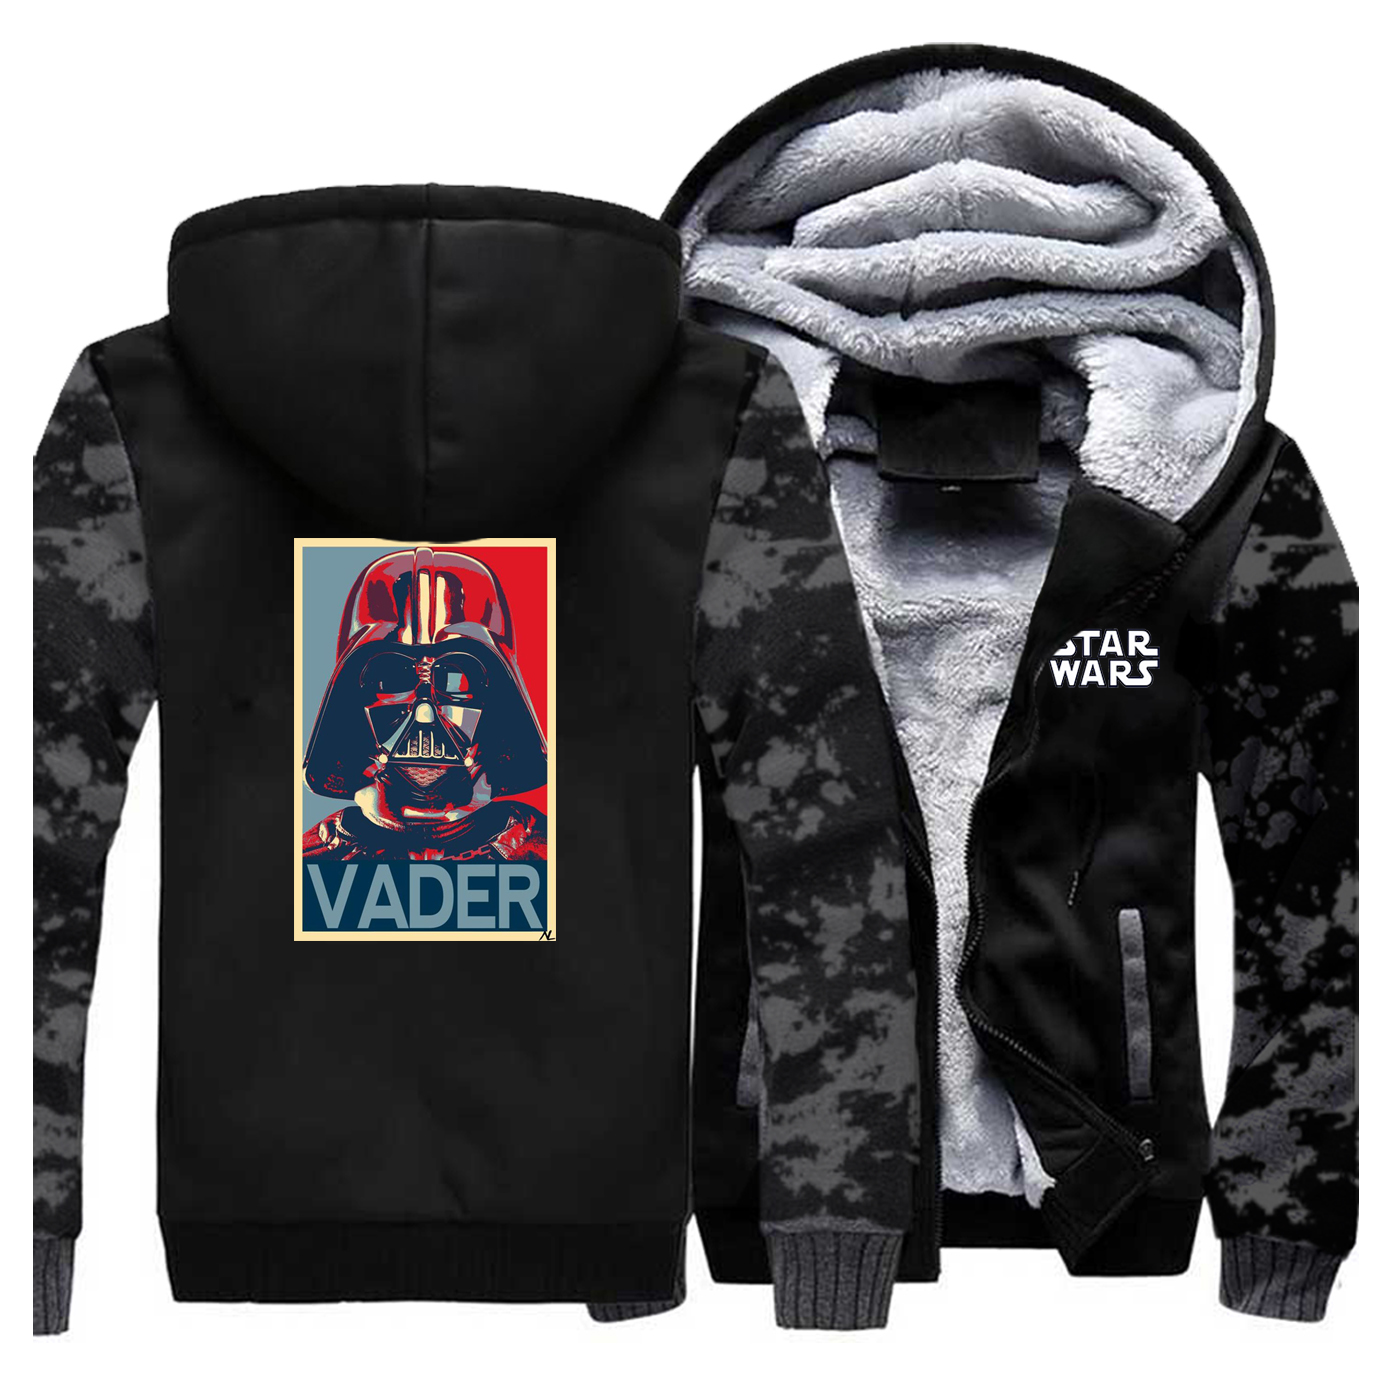 US $22.68 44% OFF|Darth Vader Star Wars Stormtrooper Funny Men print hoodie New Fashion Hip Hop Pullover Winter Jacket Sweat Homme Coats in Hoodies &